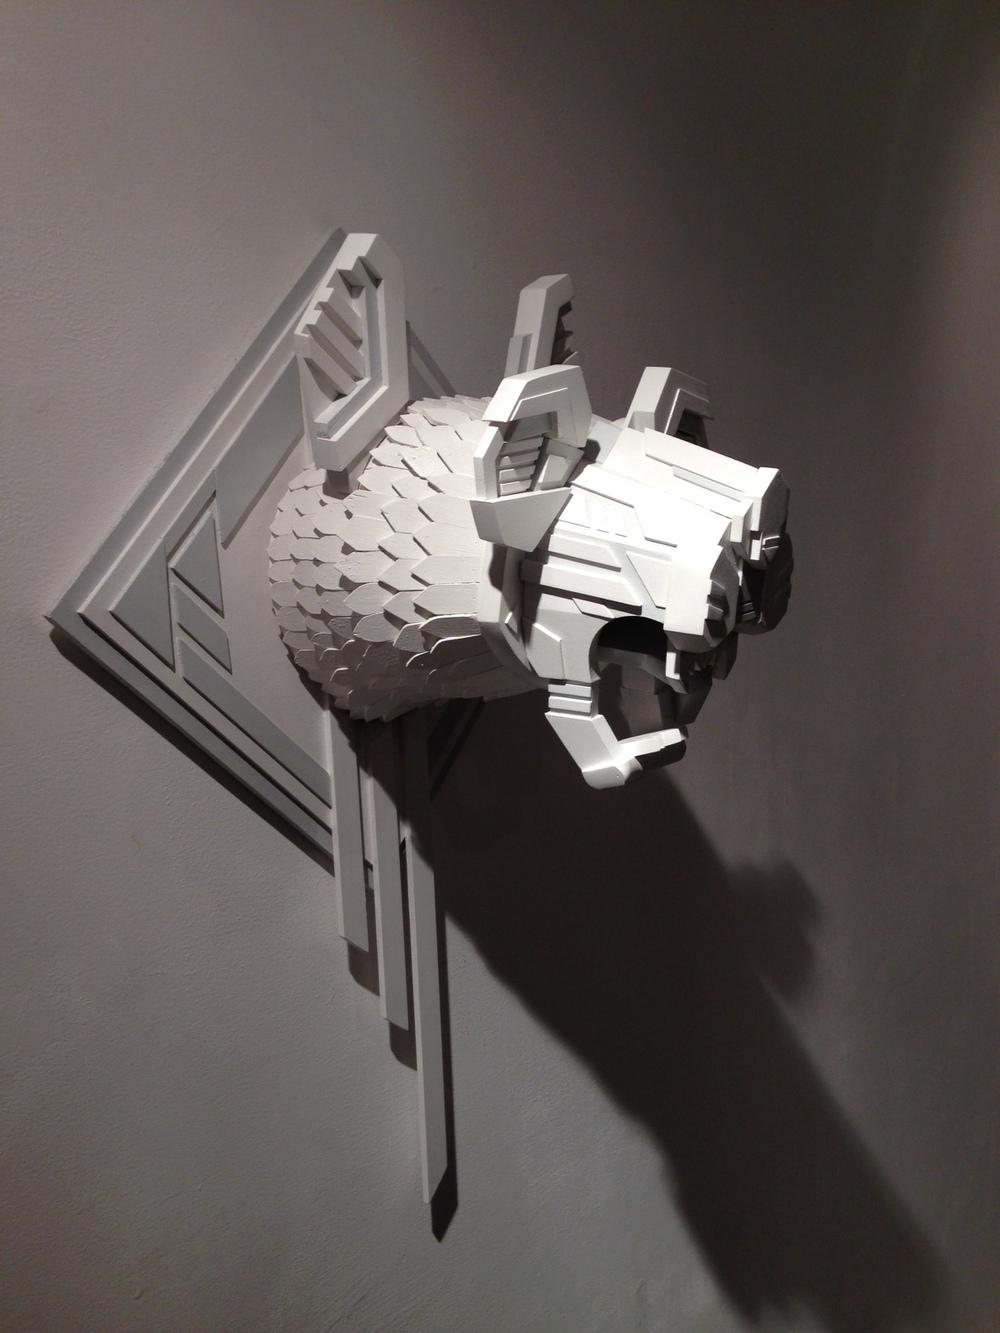 Tadaomi Shibuya x AJ Fosik - Beast artwork